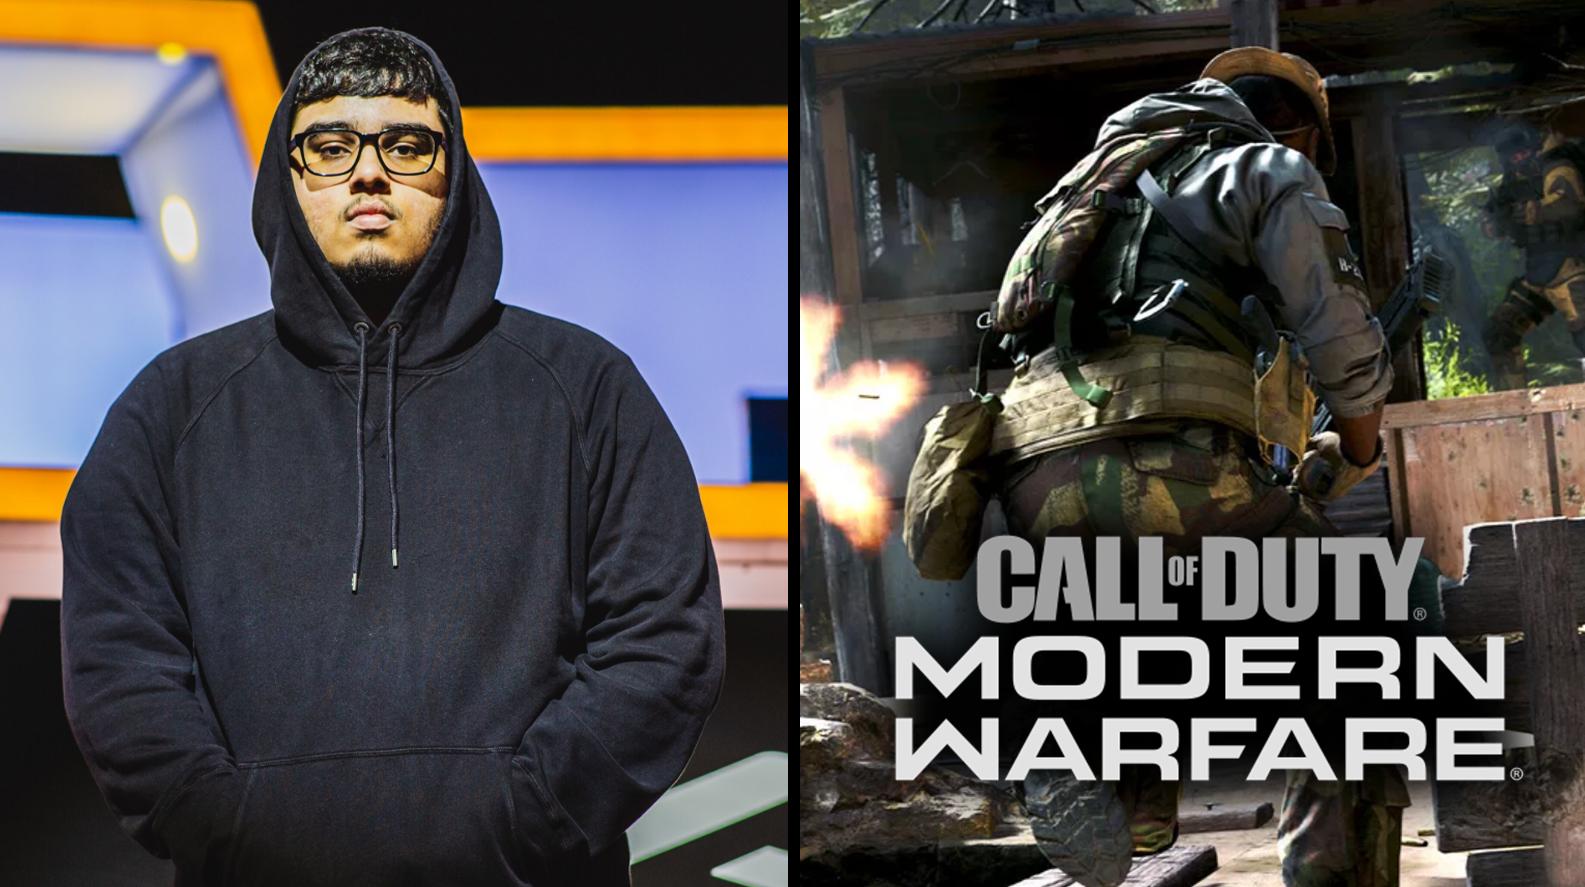 Team Envy / Infinity Ward - Modern Warfare